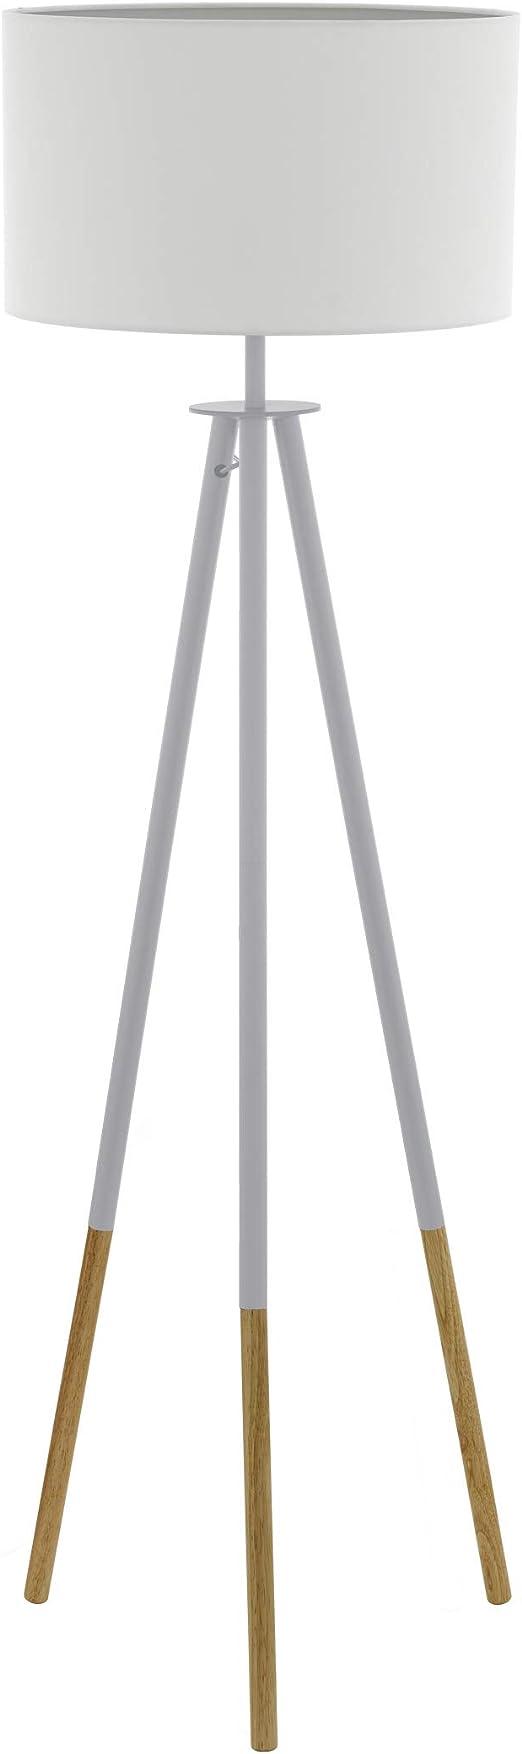 EGLO 49156 Lámpara de pie, 60 W, Braun, Weiss